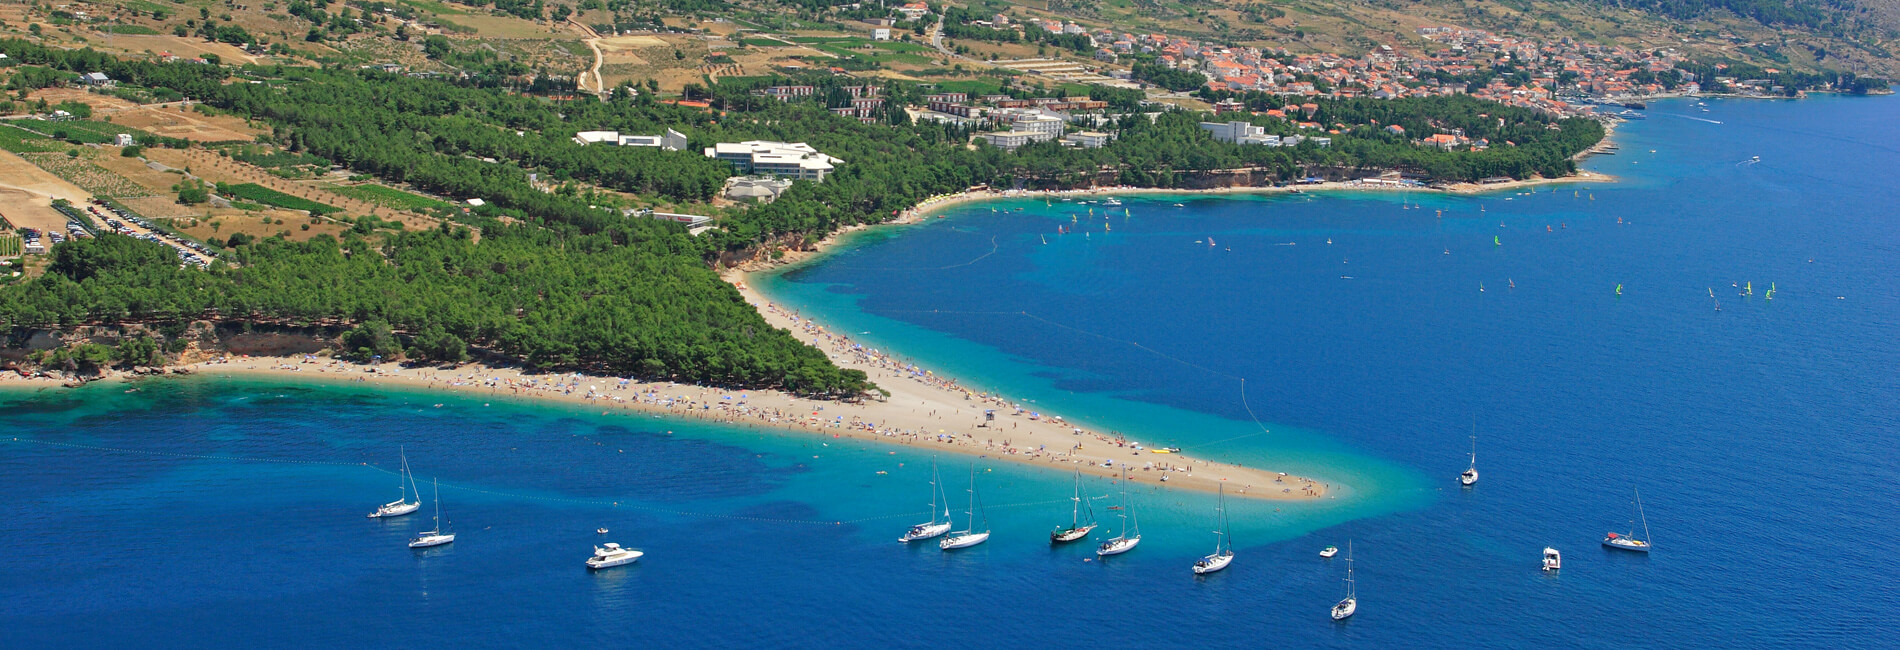 Dalmacija, Split | Adria Camps